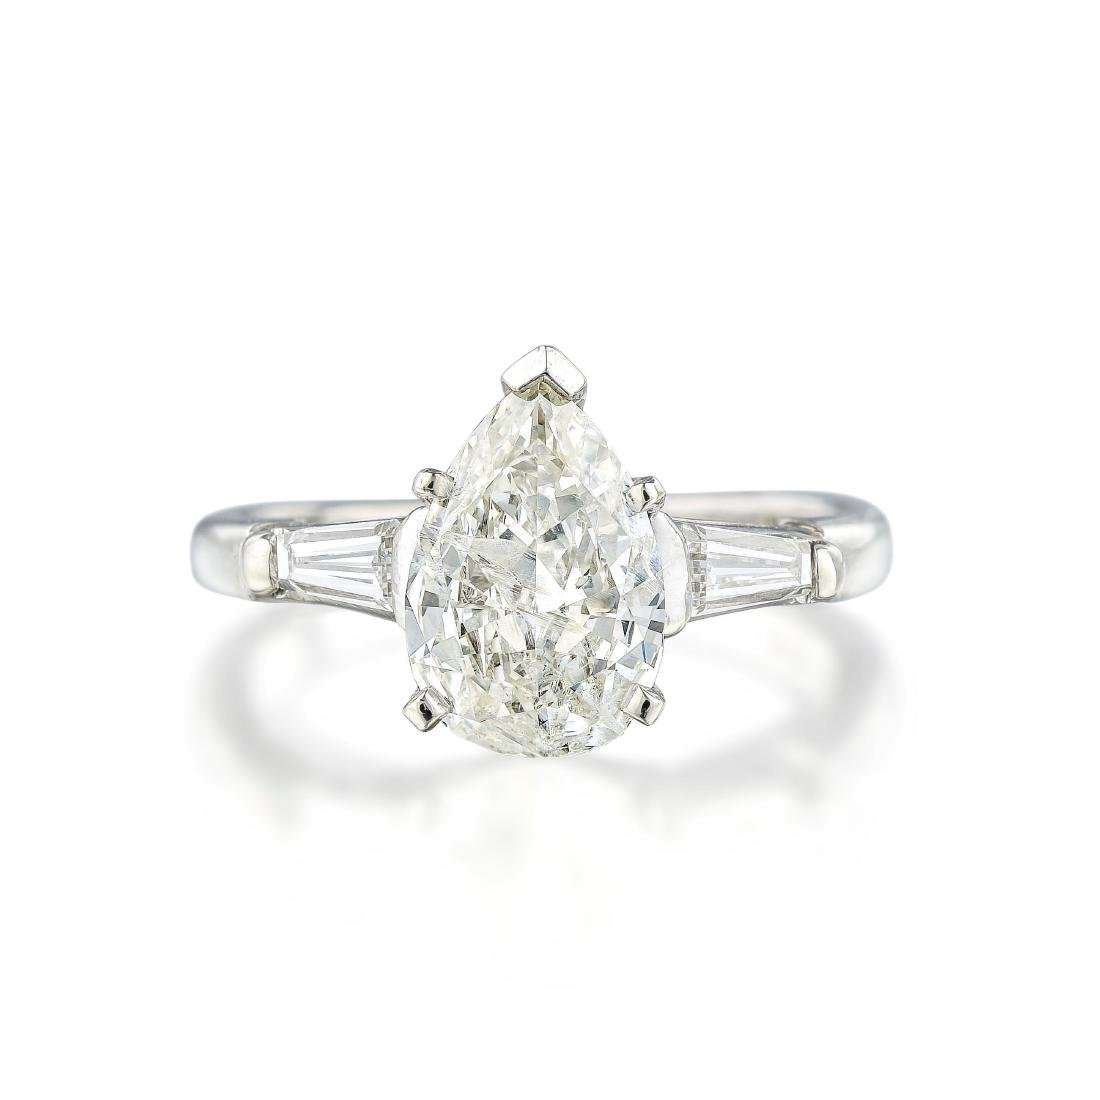 A 1.13-Carat Pear-Shaped Diamond Ring